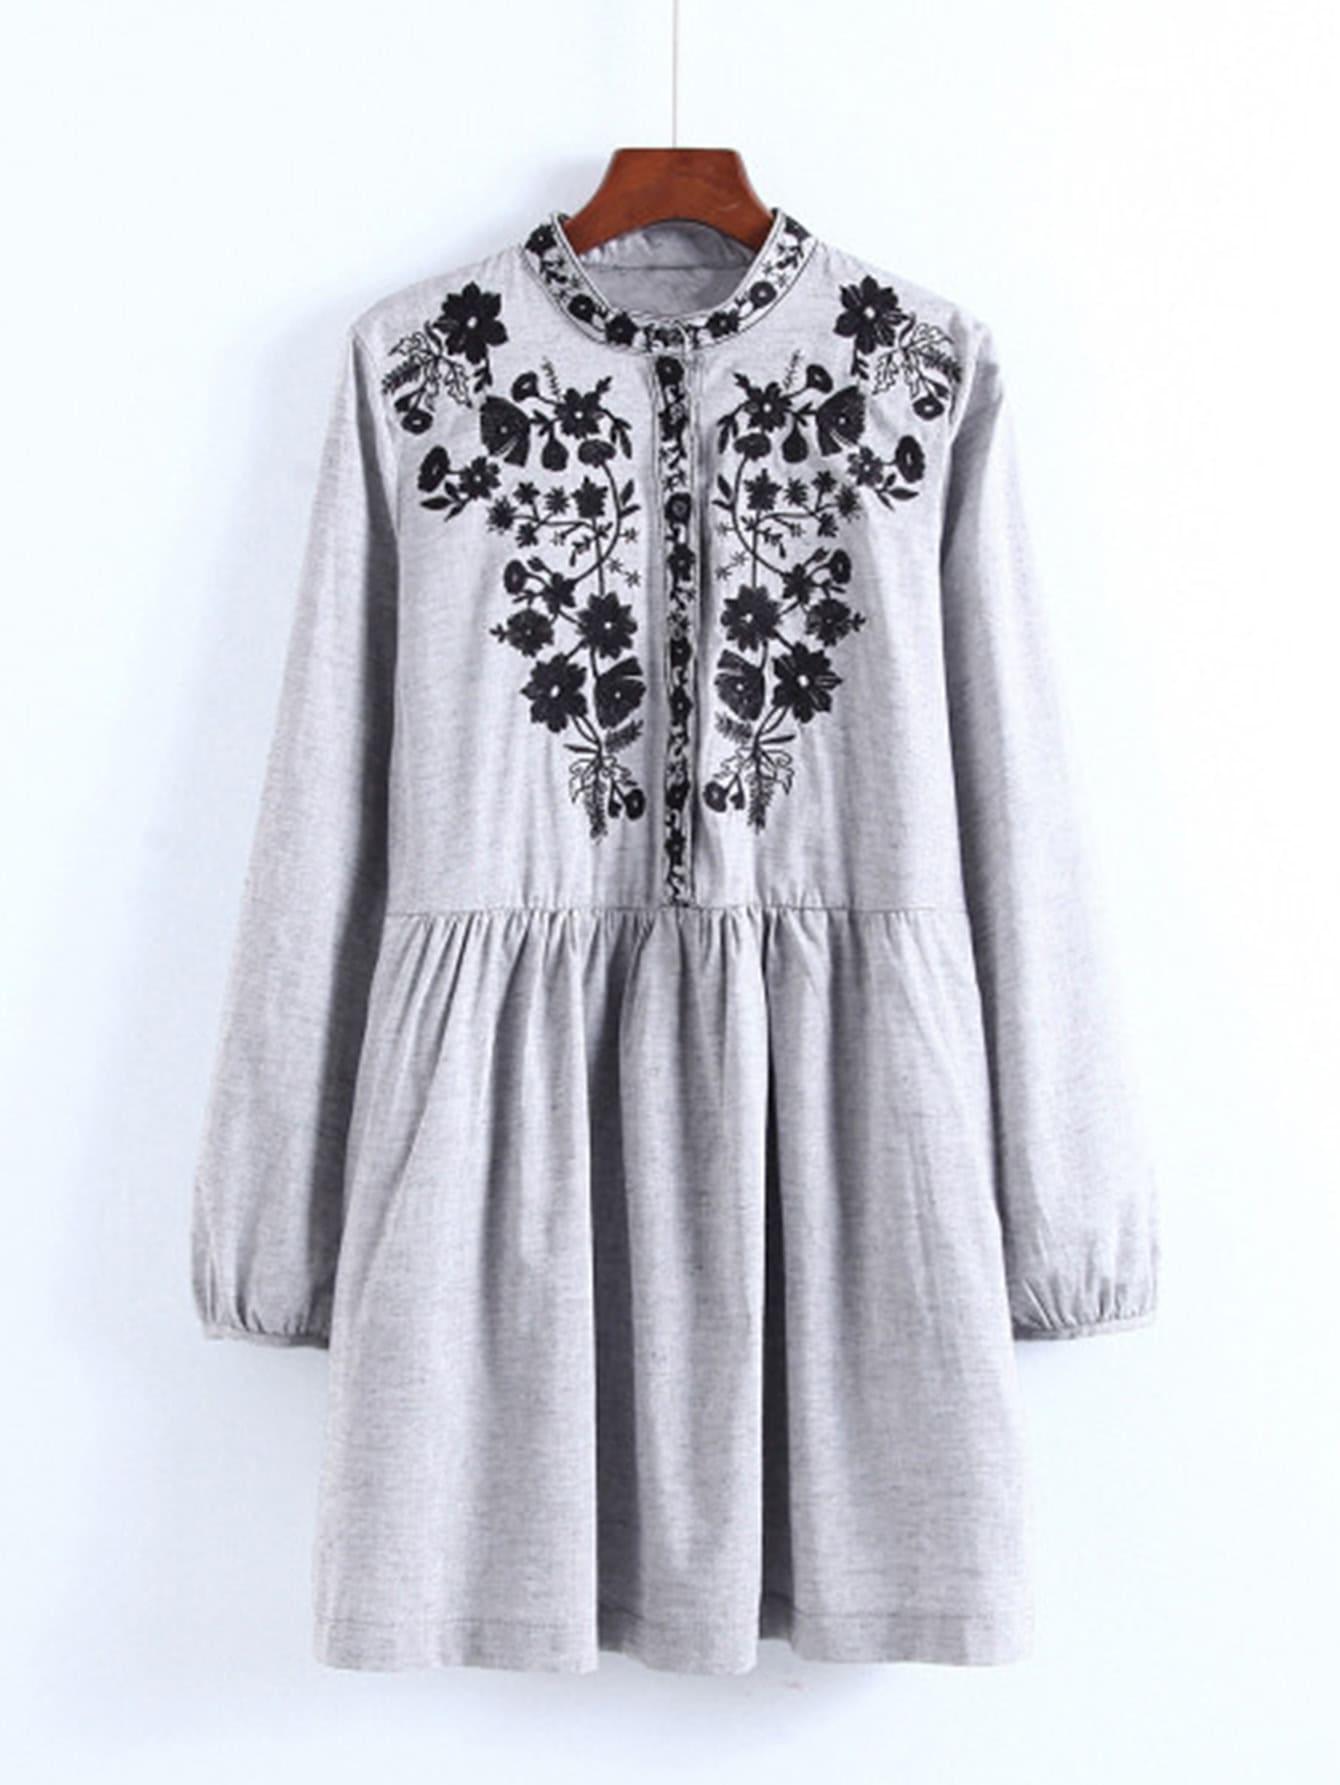 Flower Embroidery Shirt Dress symmetric flower embroidery t shirt